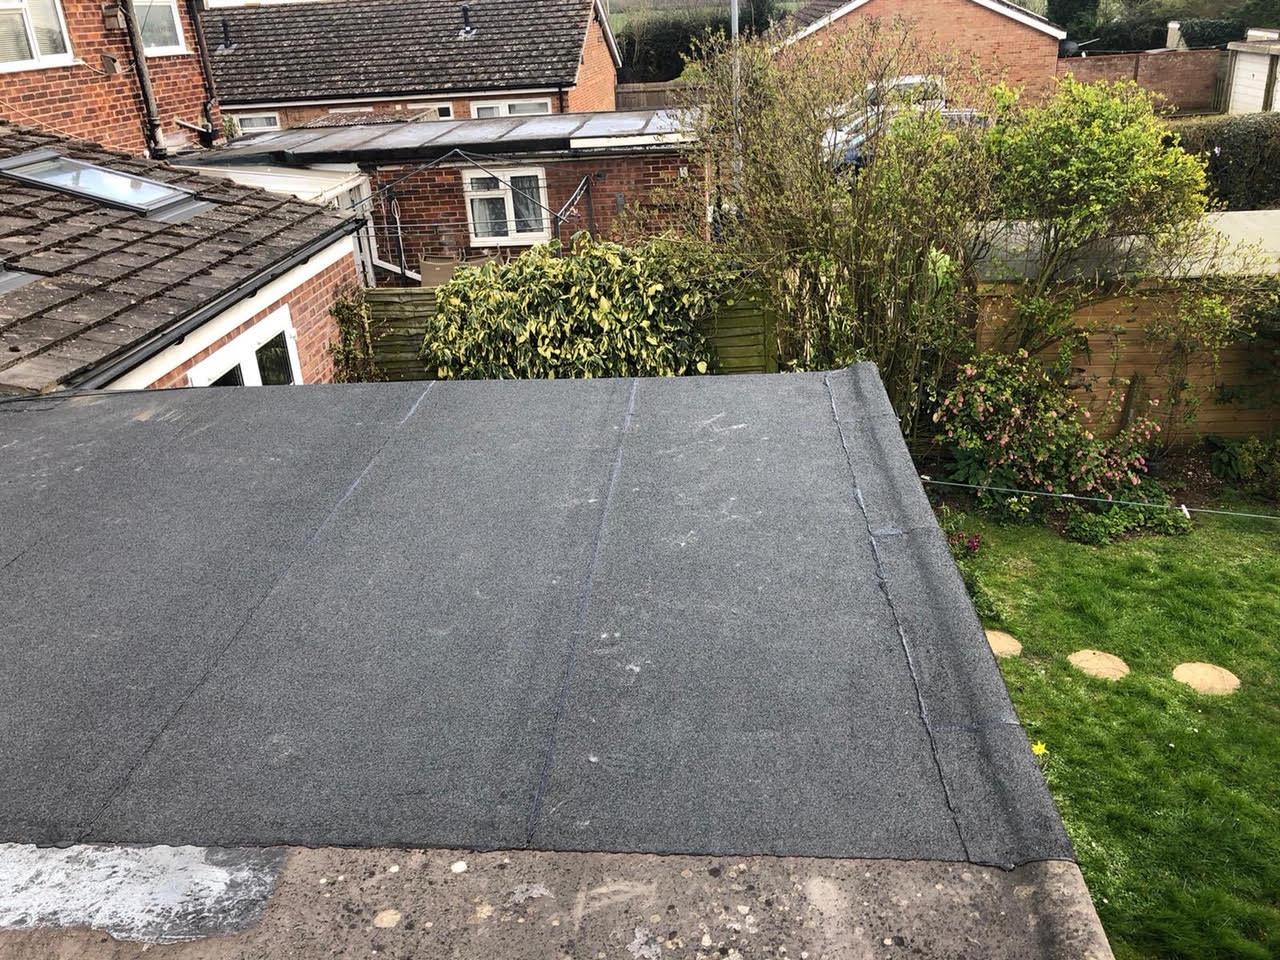 Cambridge 3 ply felt Flat Roof & Fascia 1